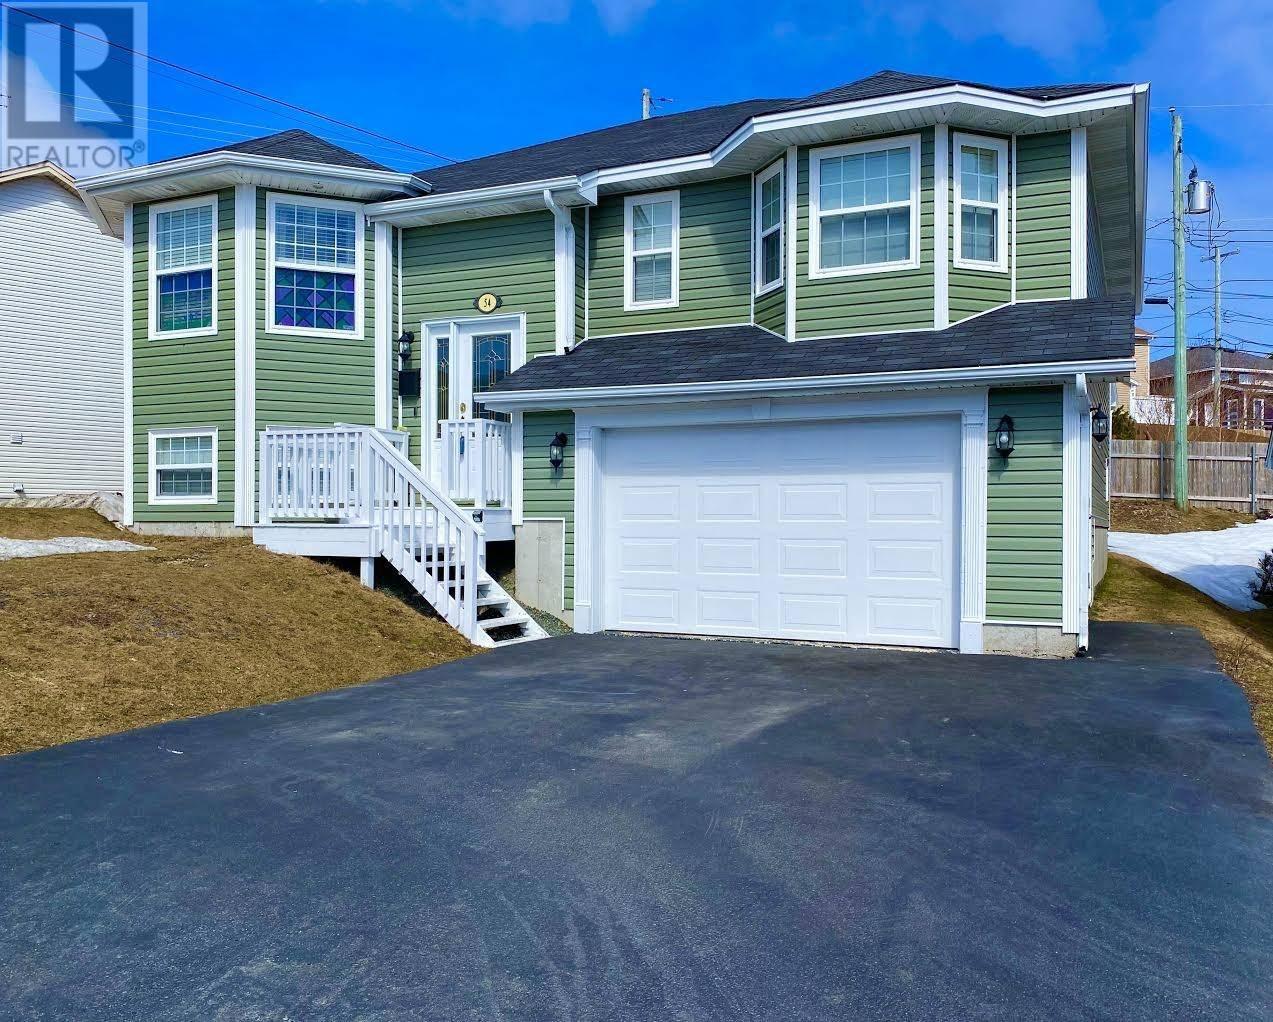 House for sale at 54 Gairlock St St. John's Newfoundland - MLS: 1212201